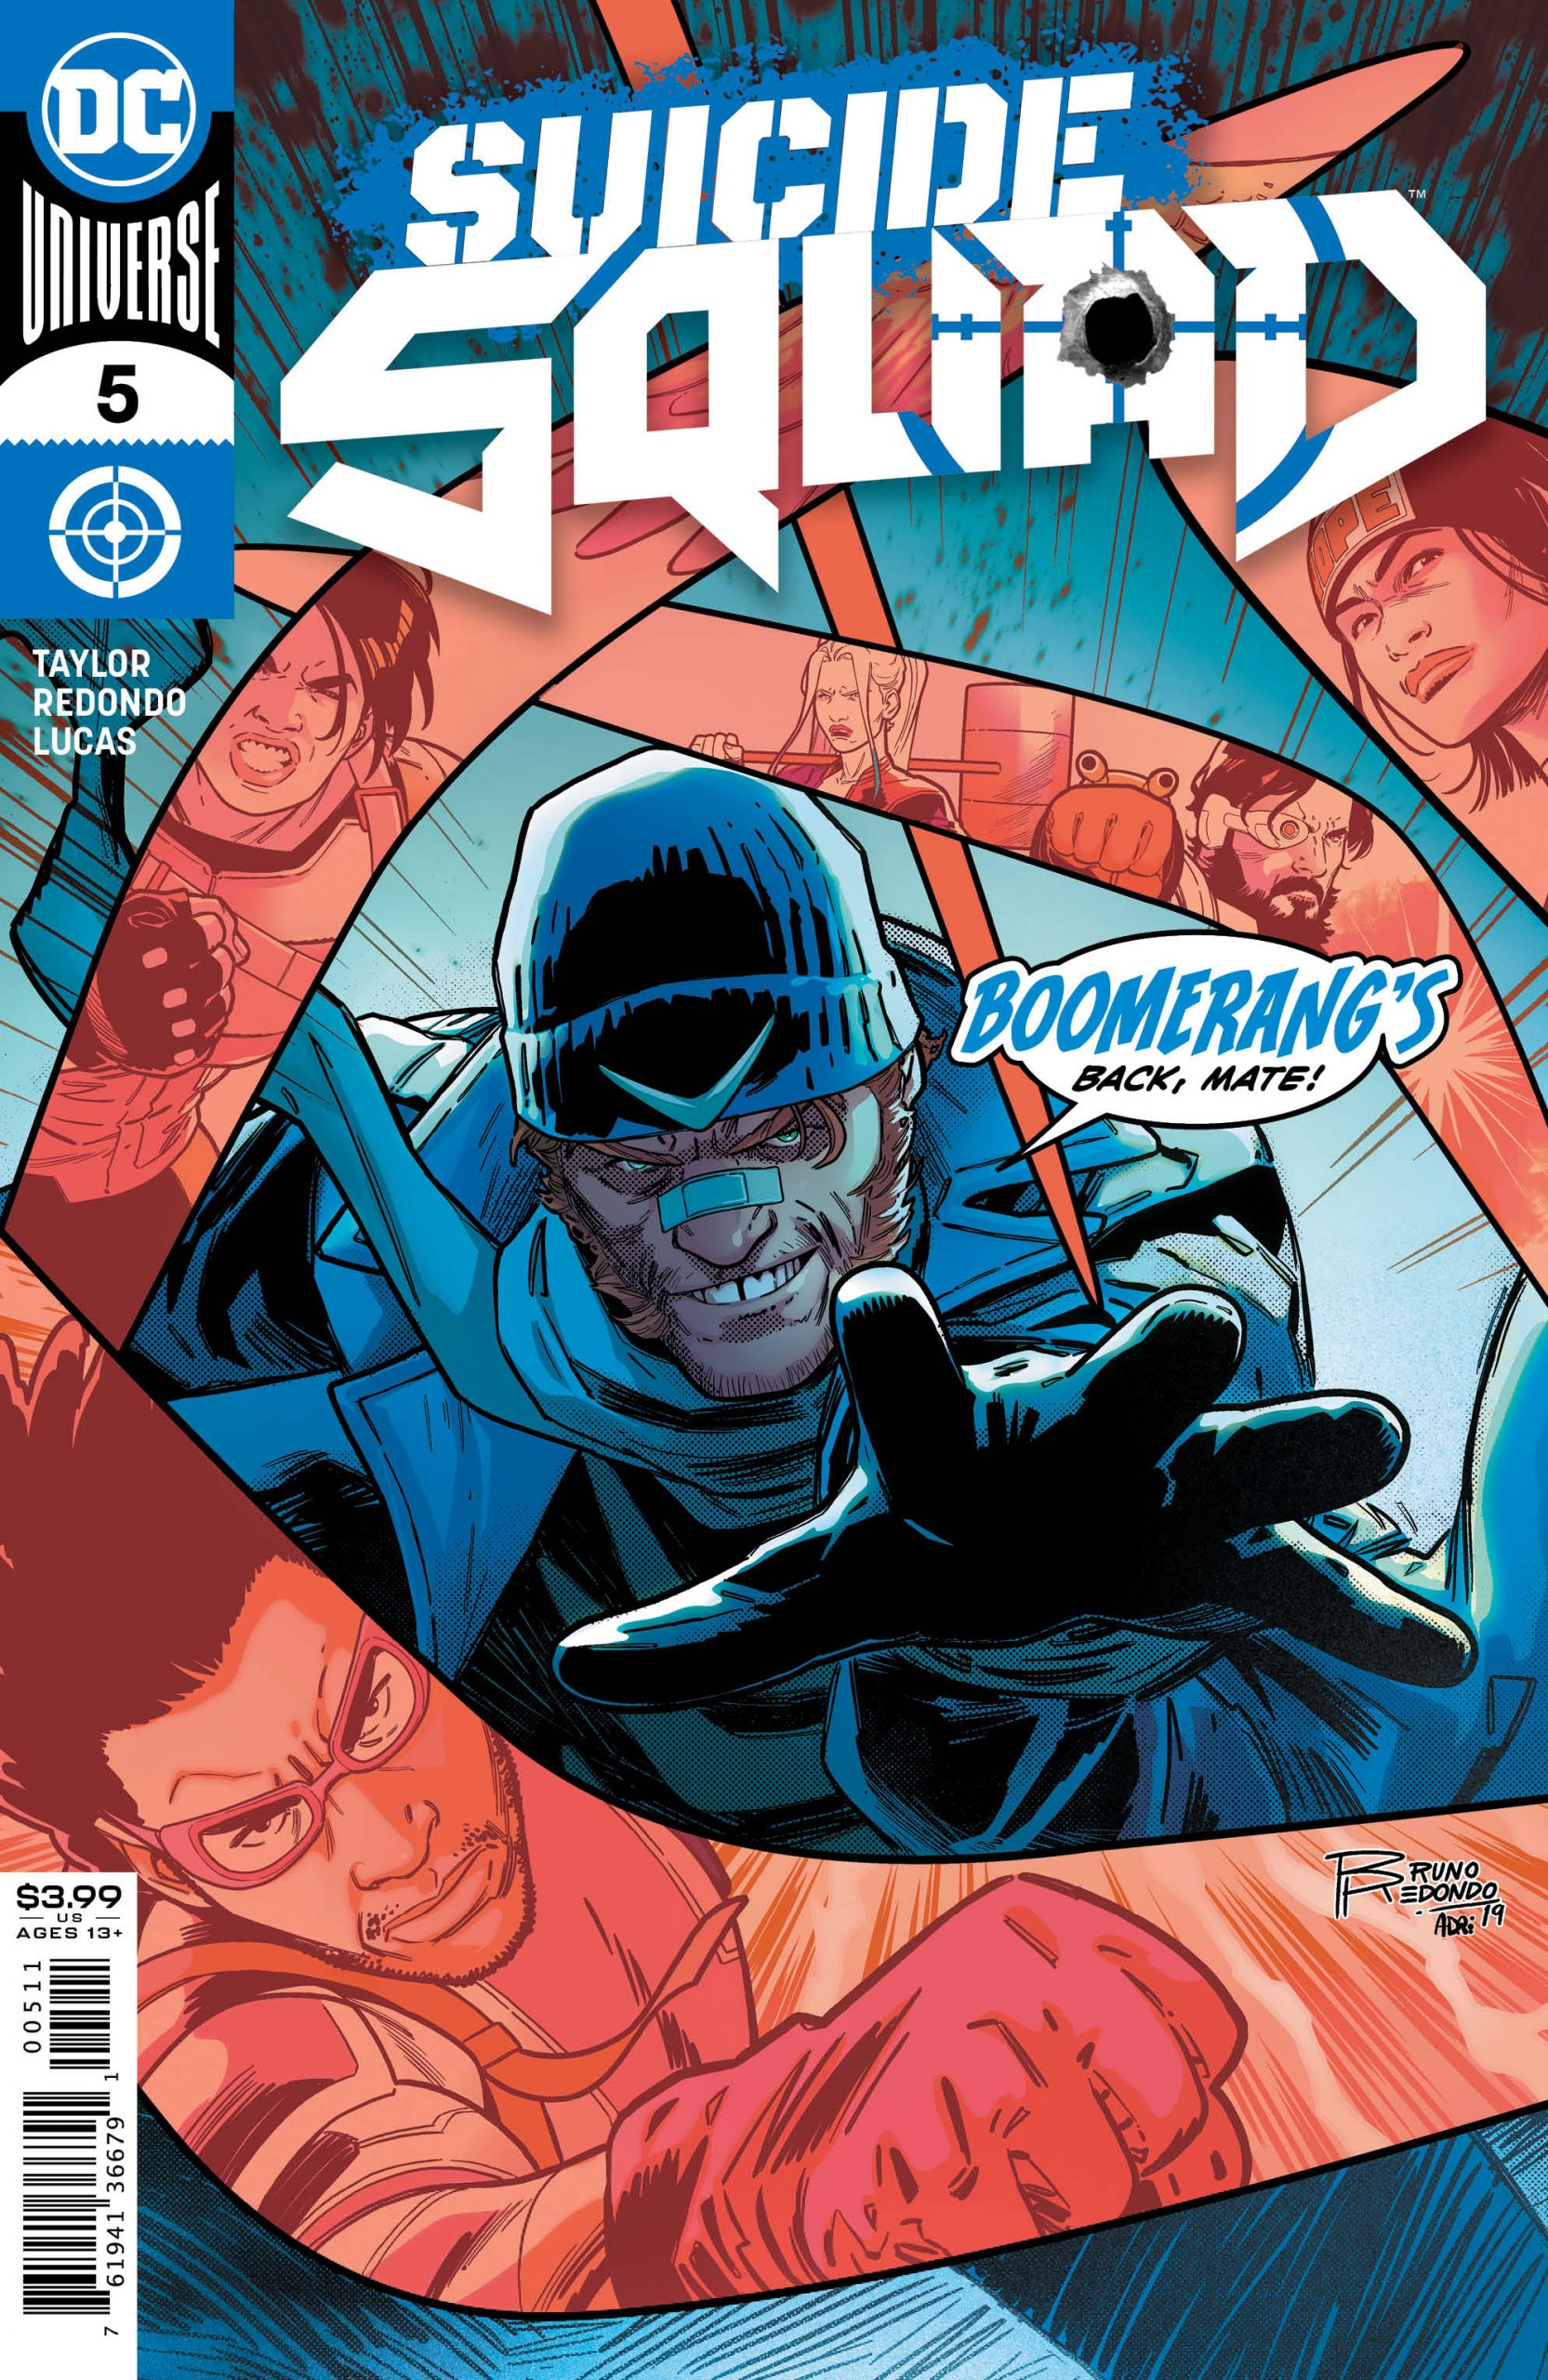 Suicide Squad #5 Cover